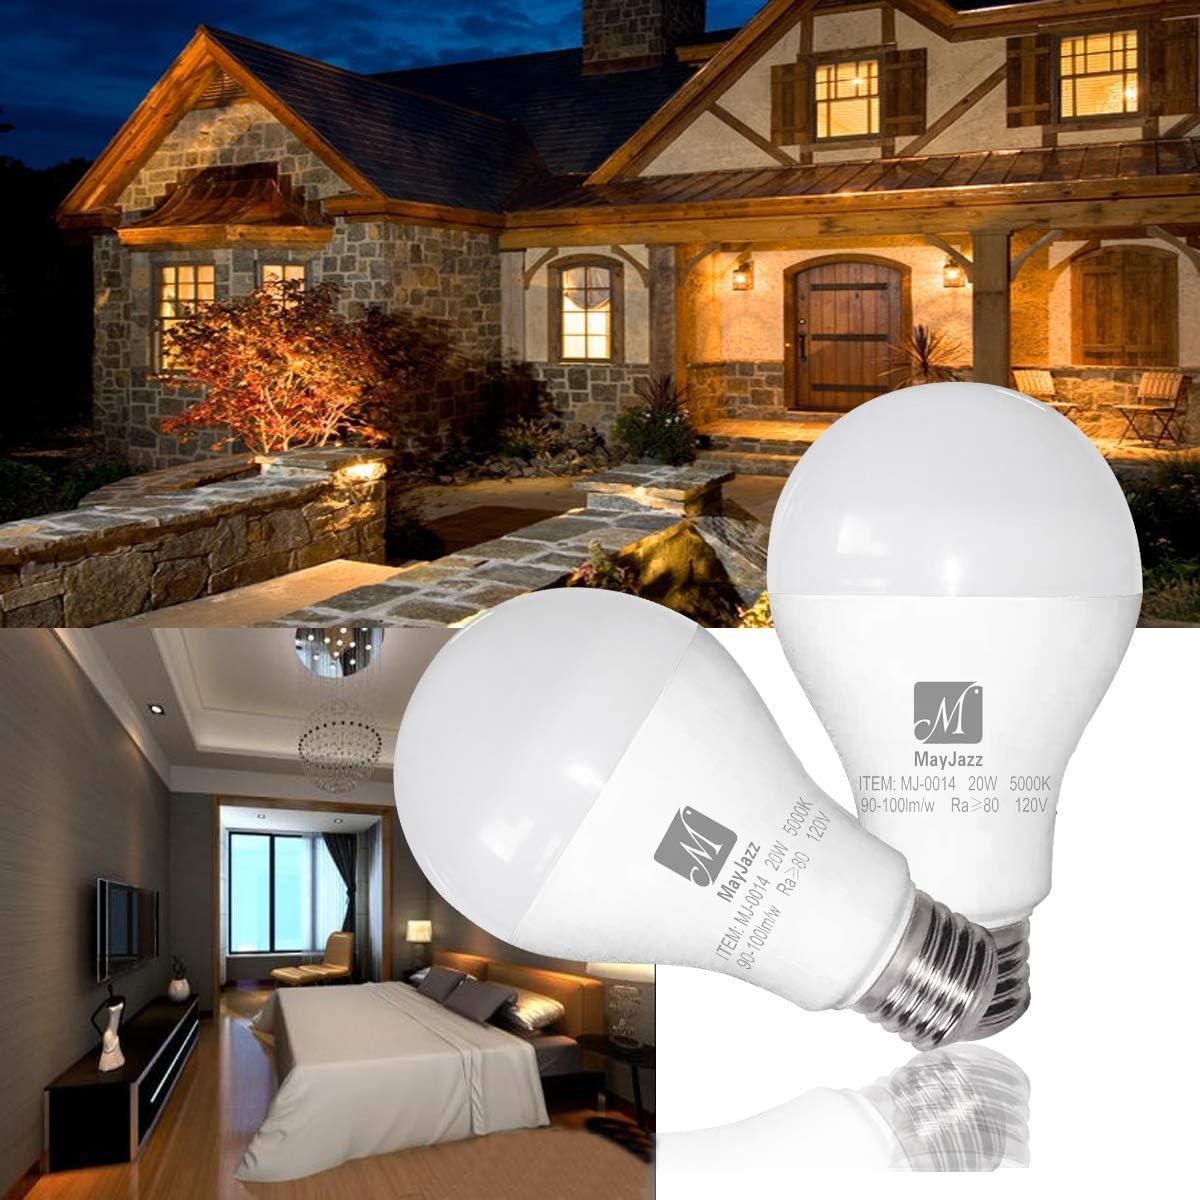 Led Light Bulbs A21 Warm White 3000k Lamp,20W 2200Lm, E26 Base Led Bulb(4 Packs)by MayJazz 125W Equivalent